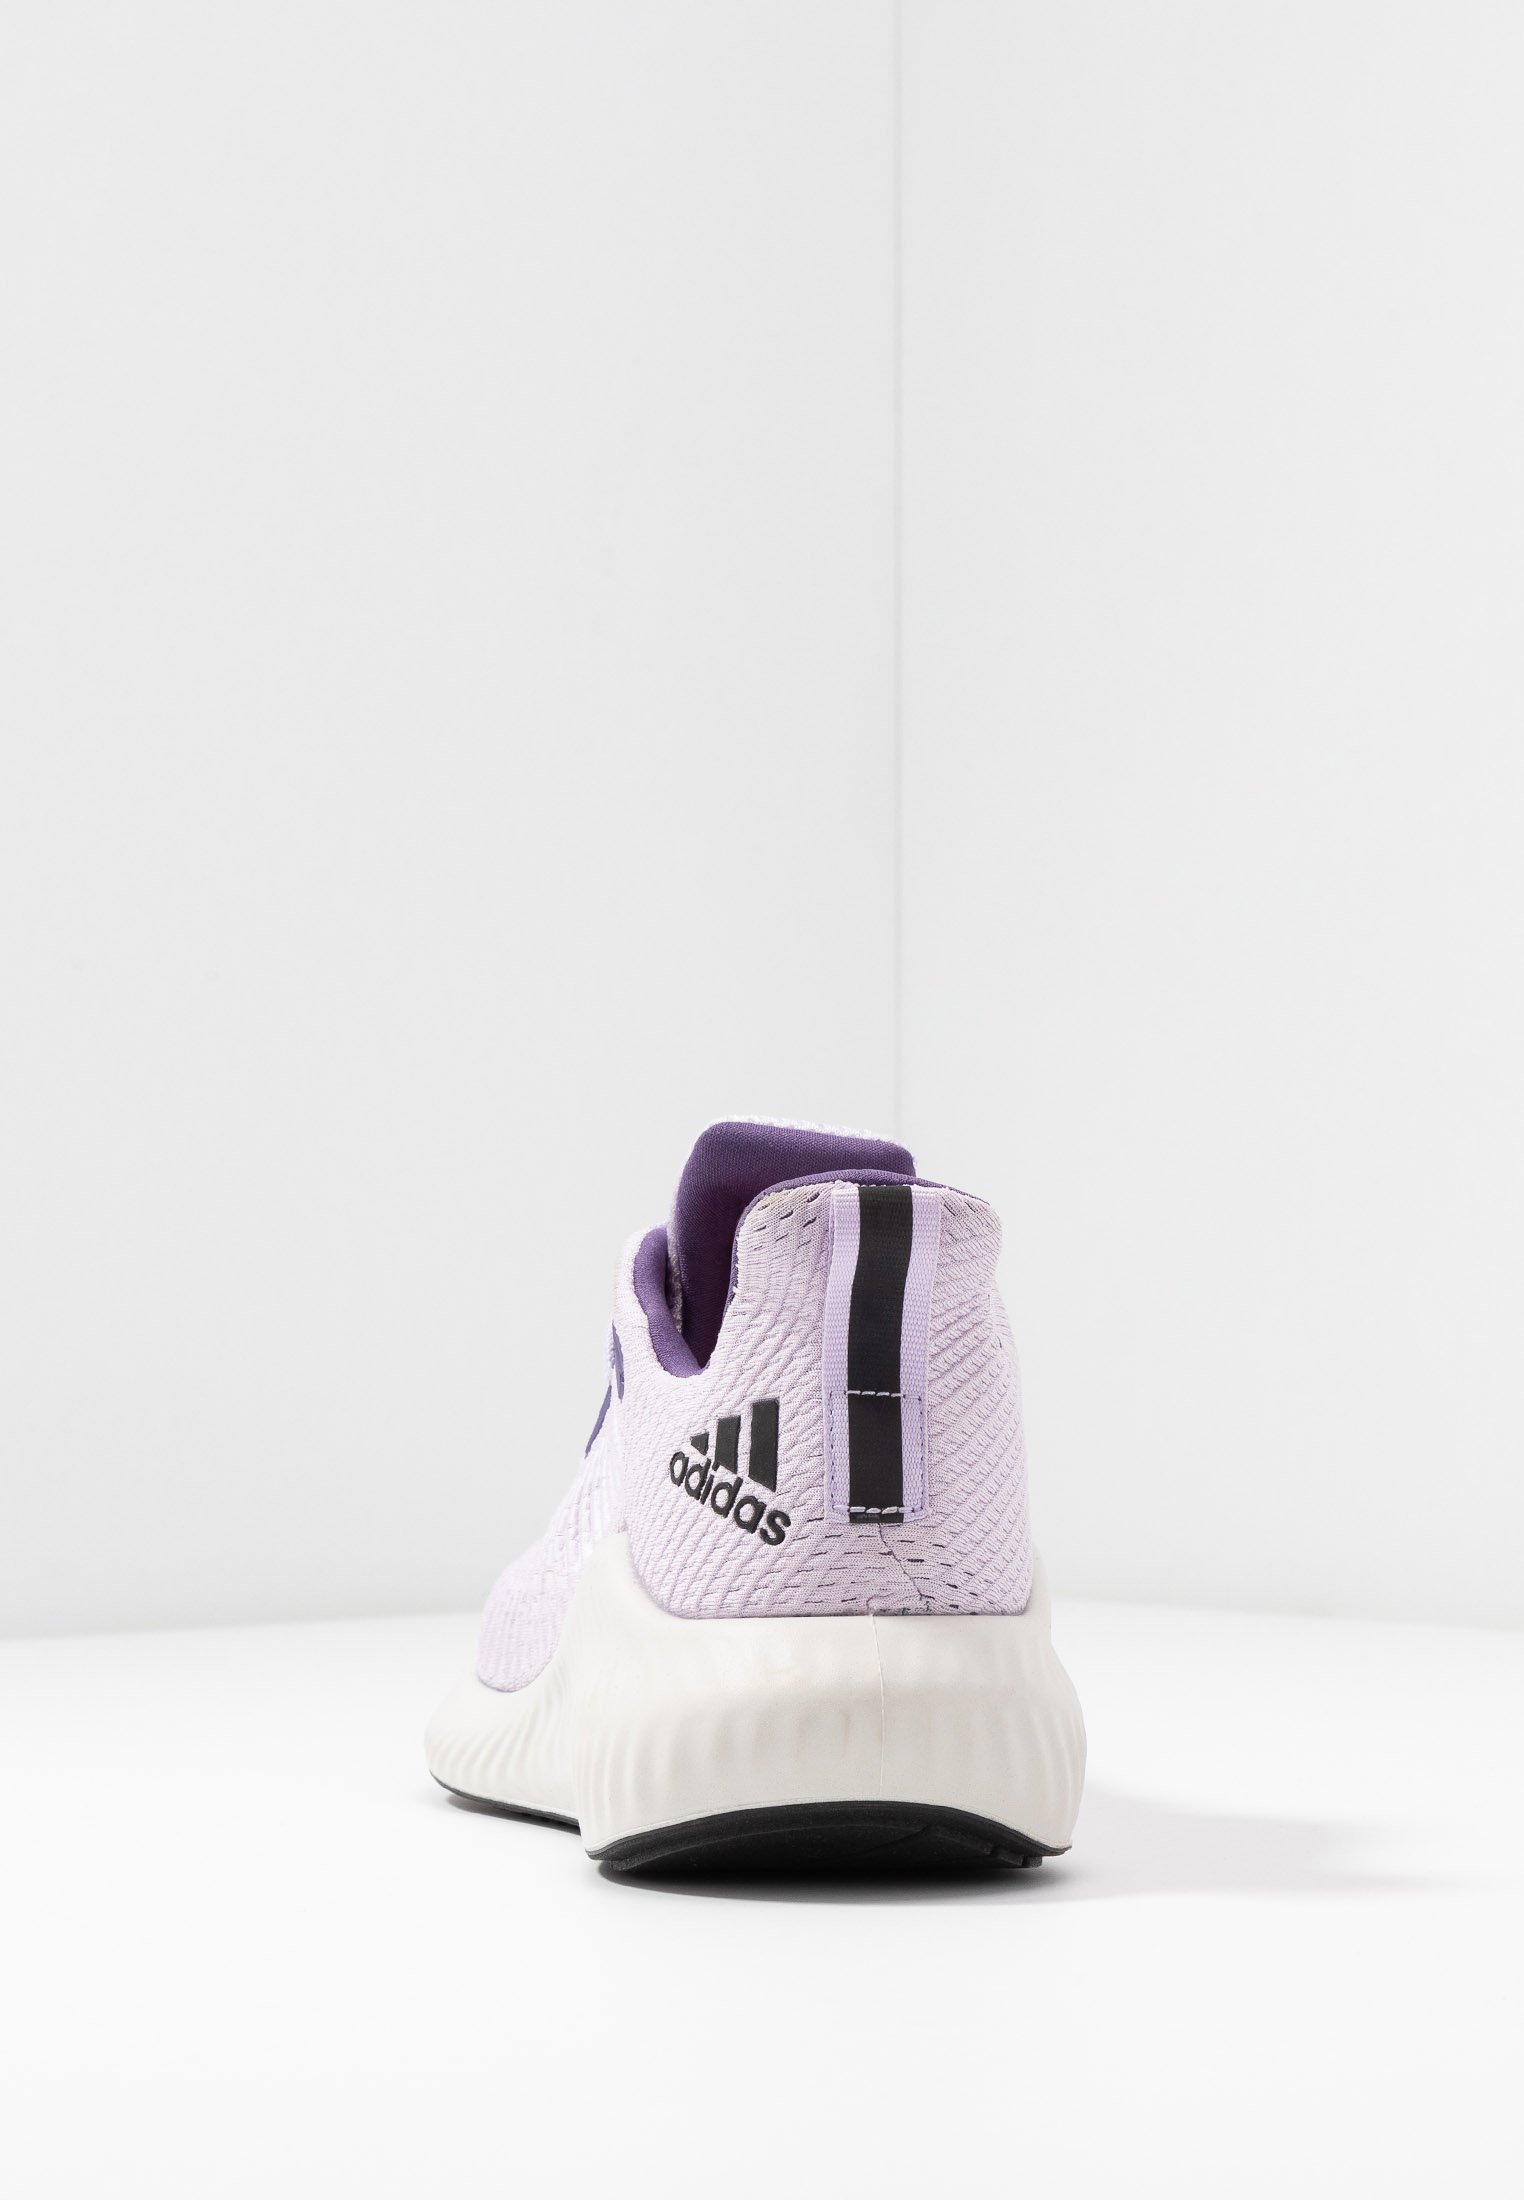 Adidas Performance Alphabounce 3 - Scarpe Running Neutre Purple Tint/core Black/tech lfNsUX1